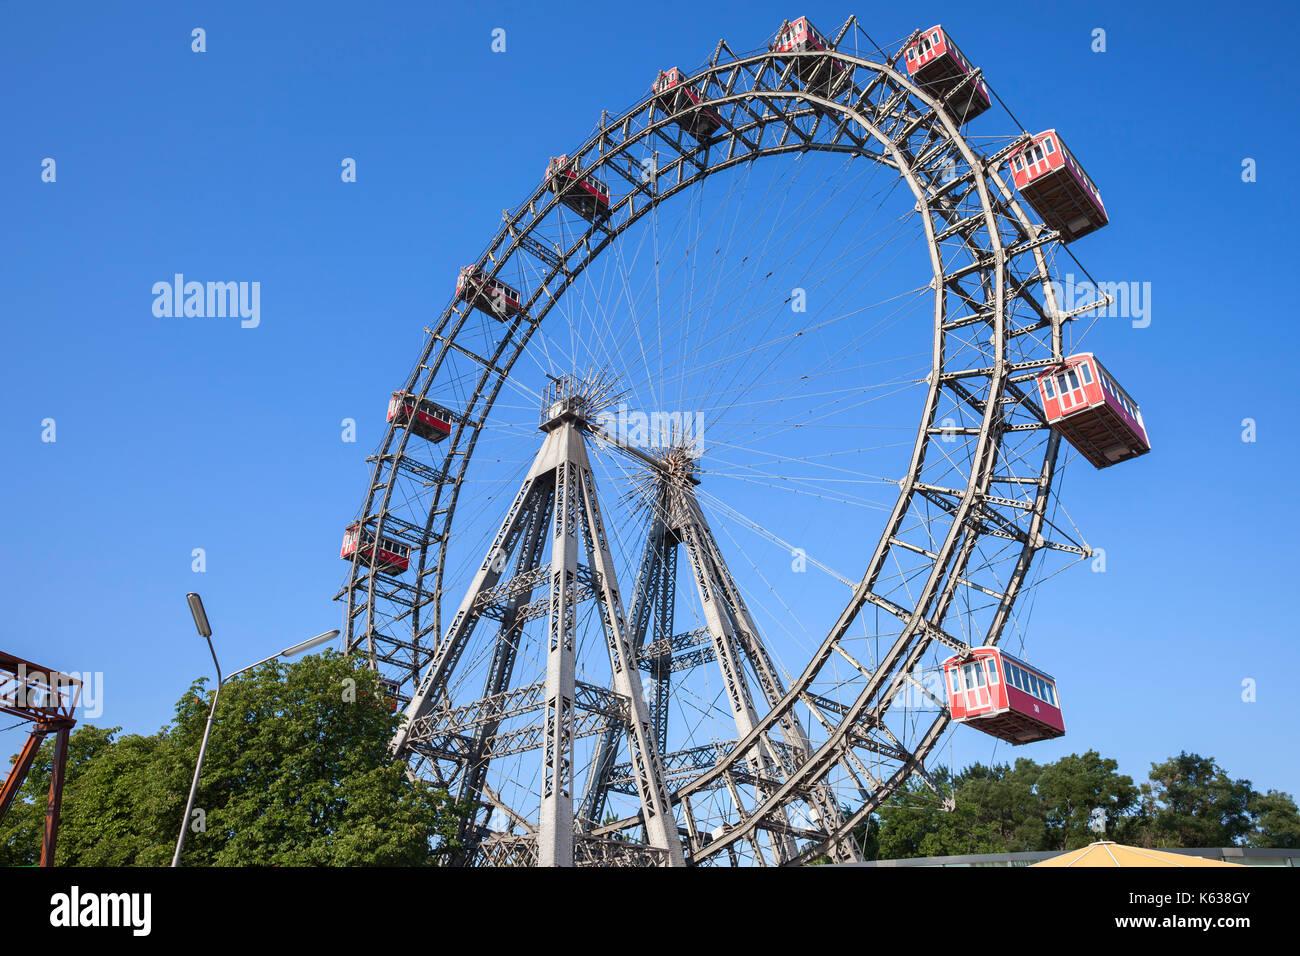 Austria, Vienna, Prater, Giant Ferris Wheel (Wiener Riesenrad) from 1897, historic city landmark - Stock Image